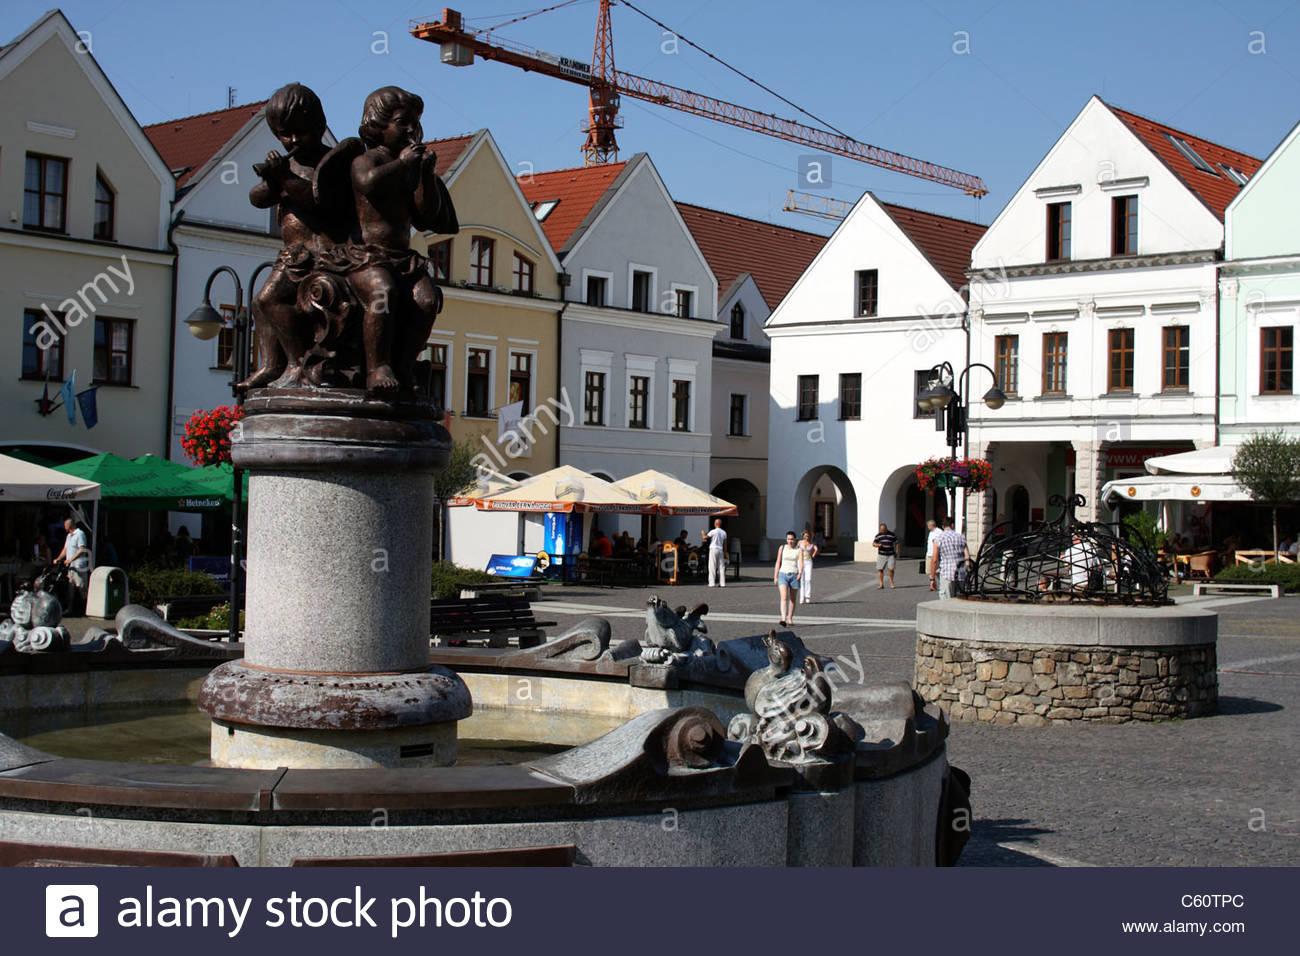 Main public square, Mariánske námestie, in Žilina, Slovakia - Stock Image